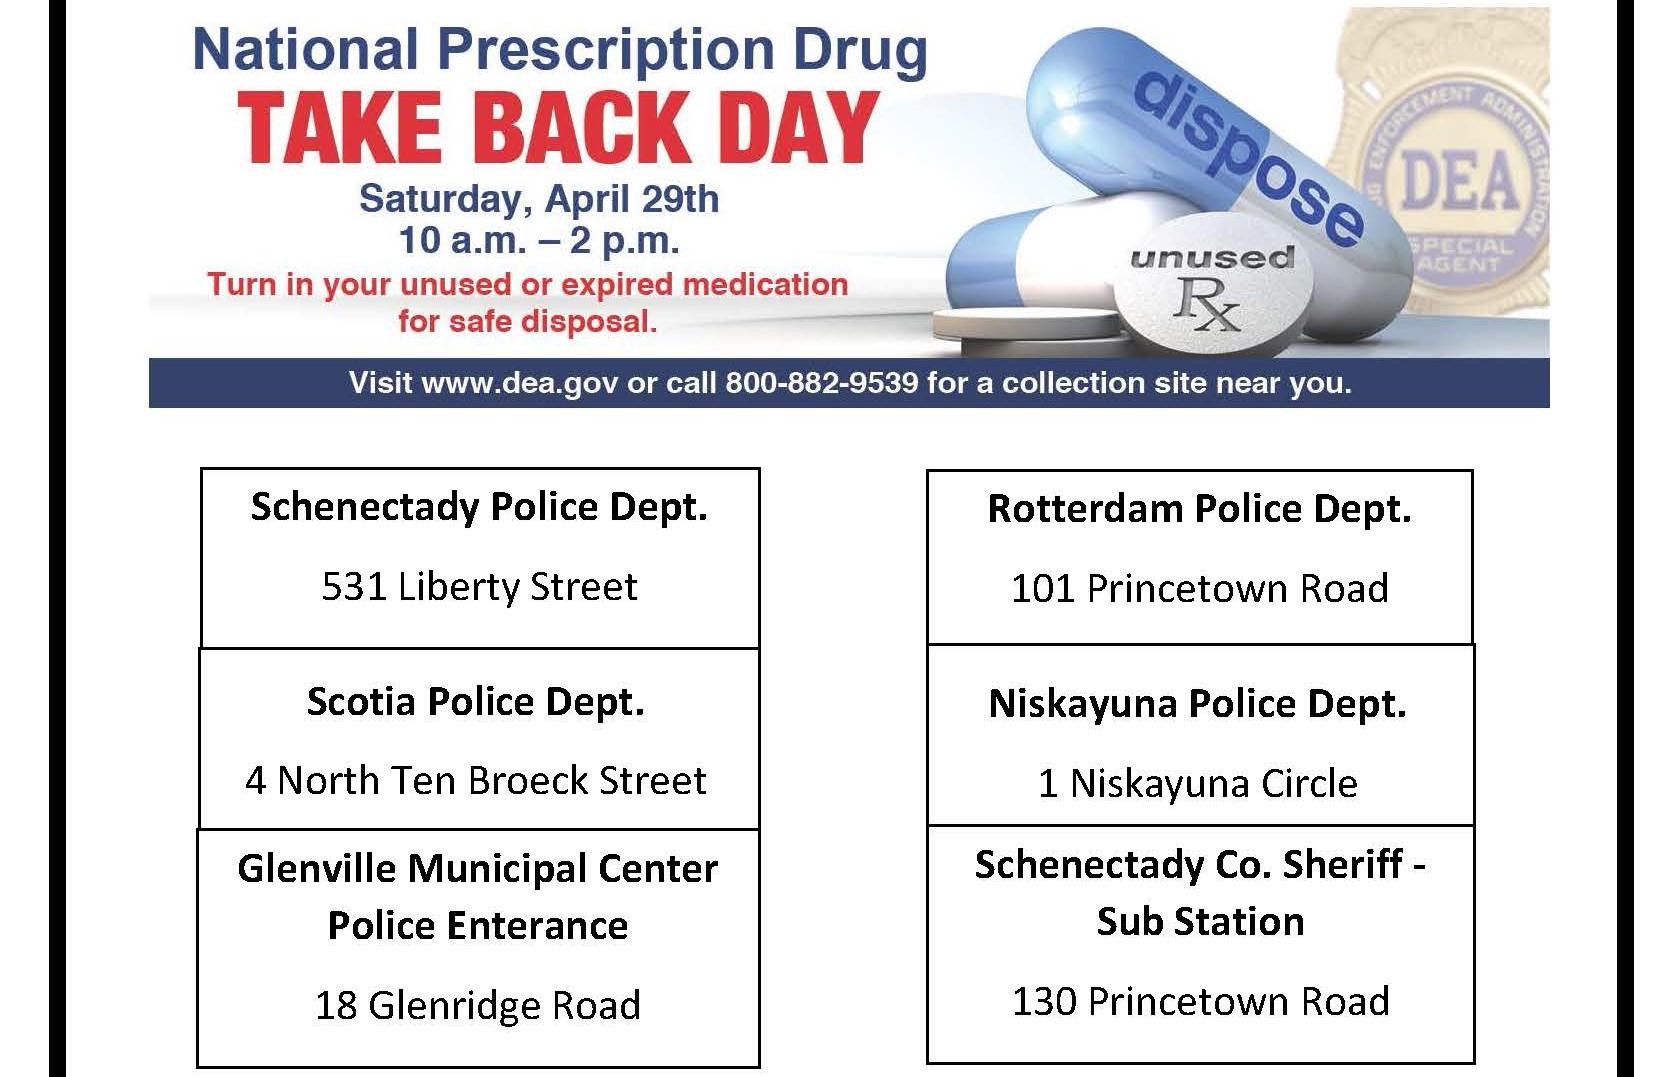 Schenectady County Drug Take Back Day